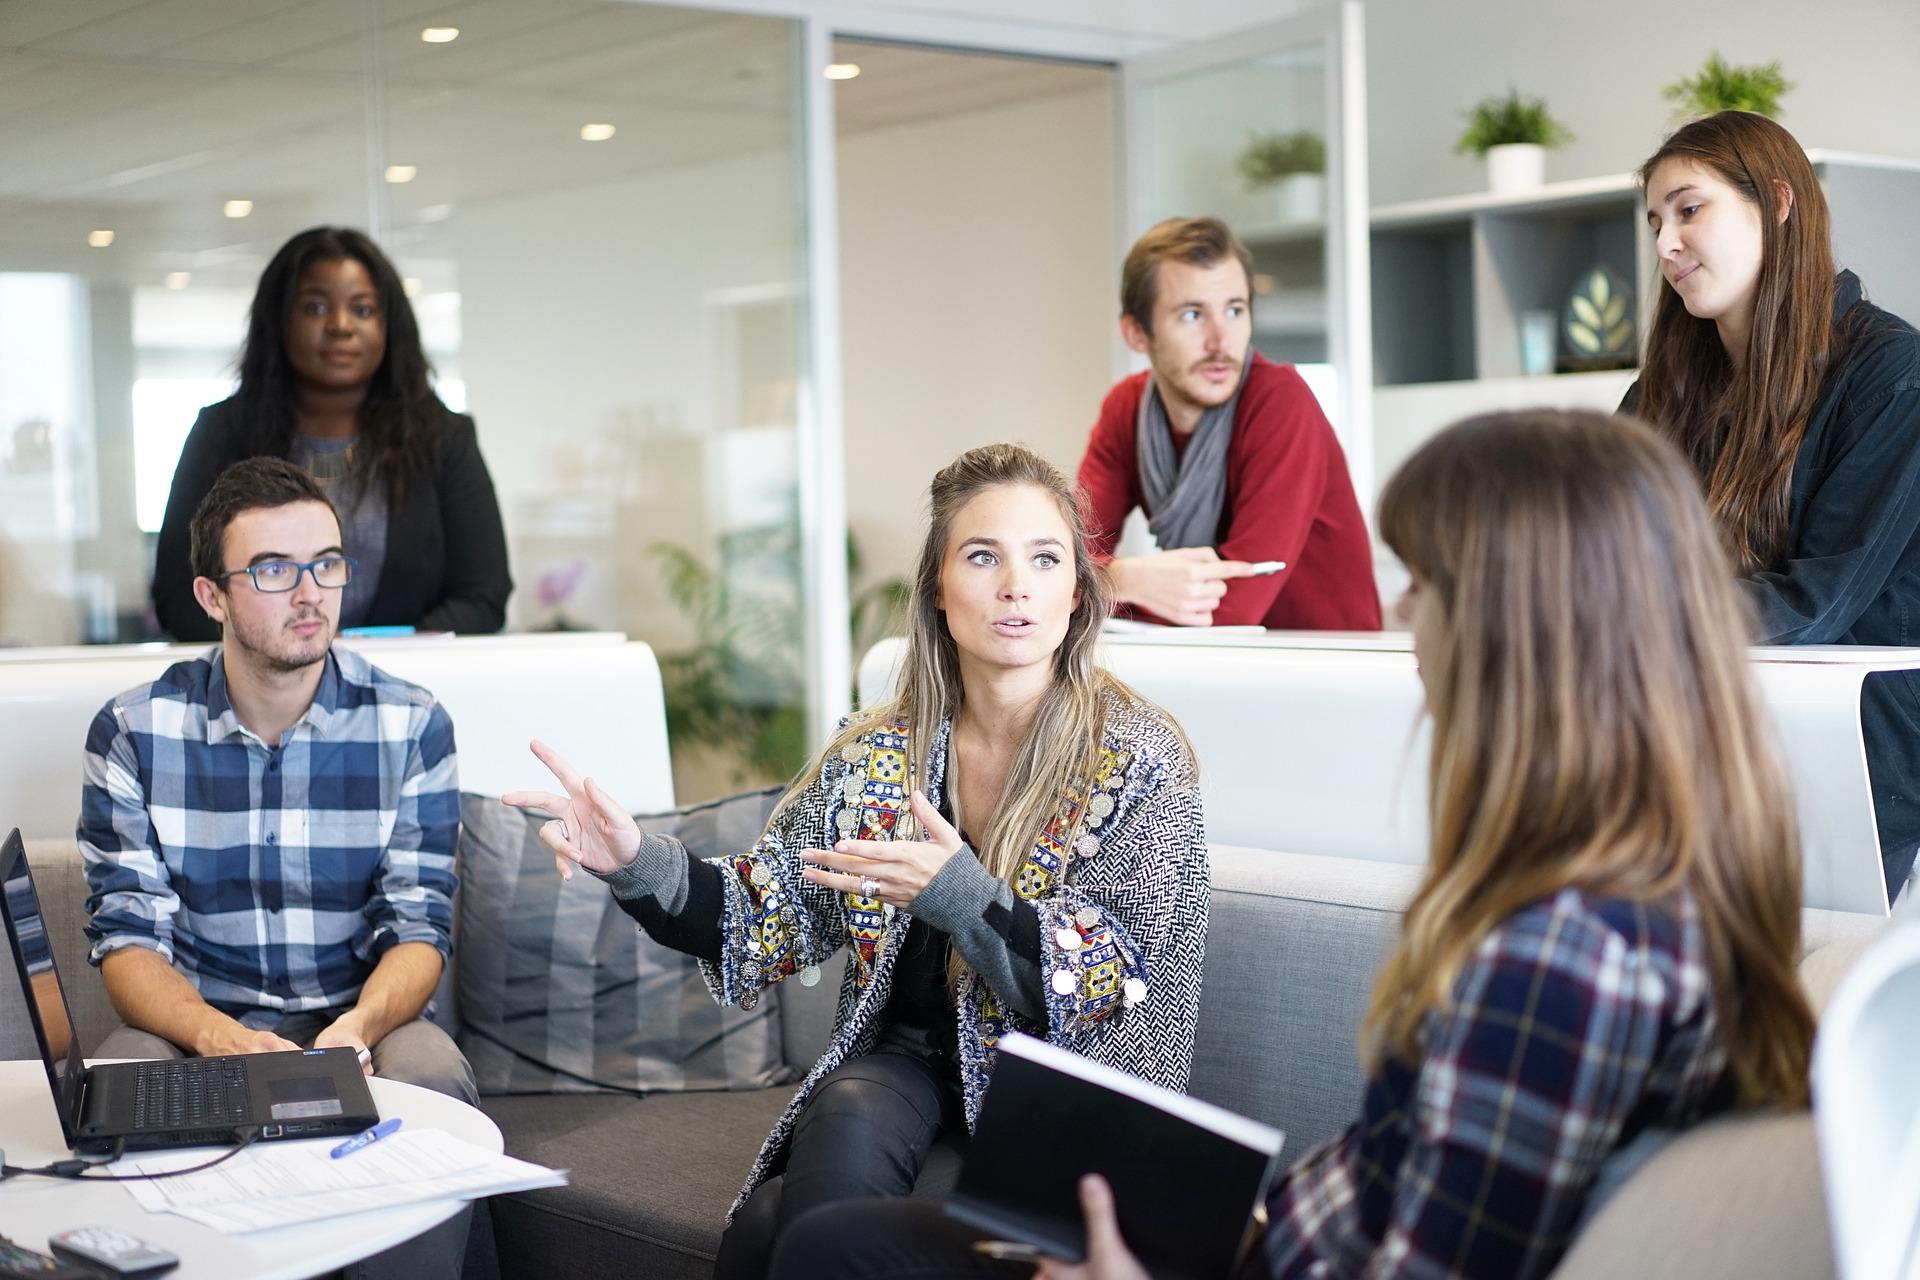 Professional Development Coaching Services Regina and Weyburn, Saskatchewan | Roberta Lynn | Motivational Life Coach Regina | Motivational Life Coach Weyburn | Career Advancement Tips